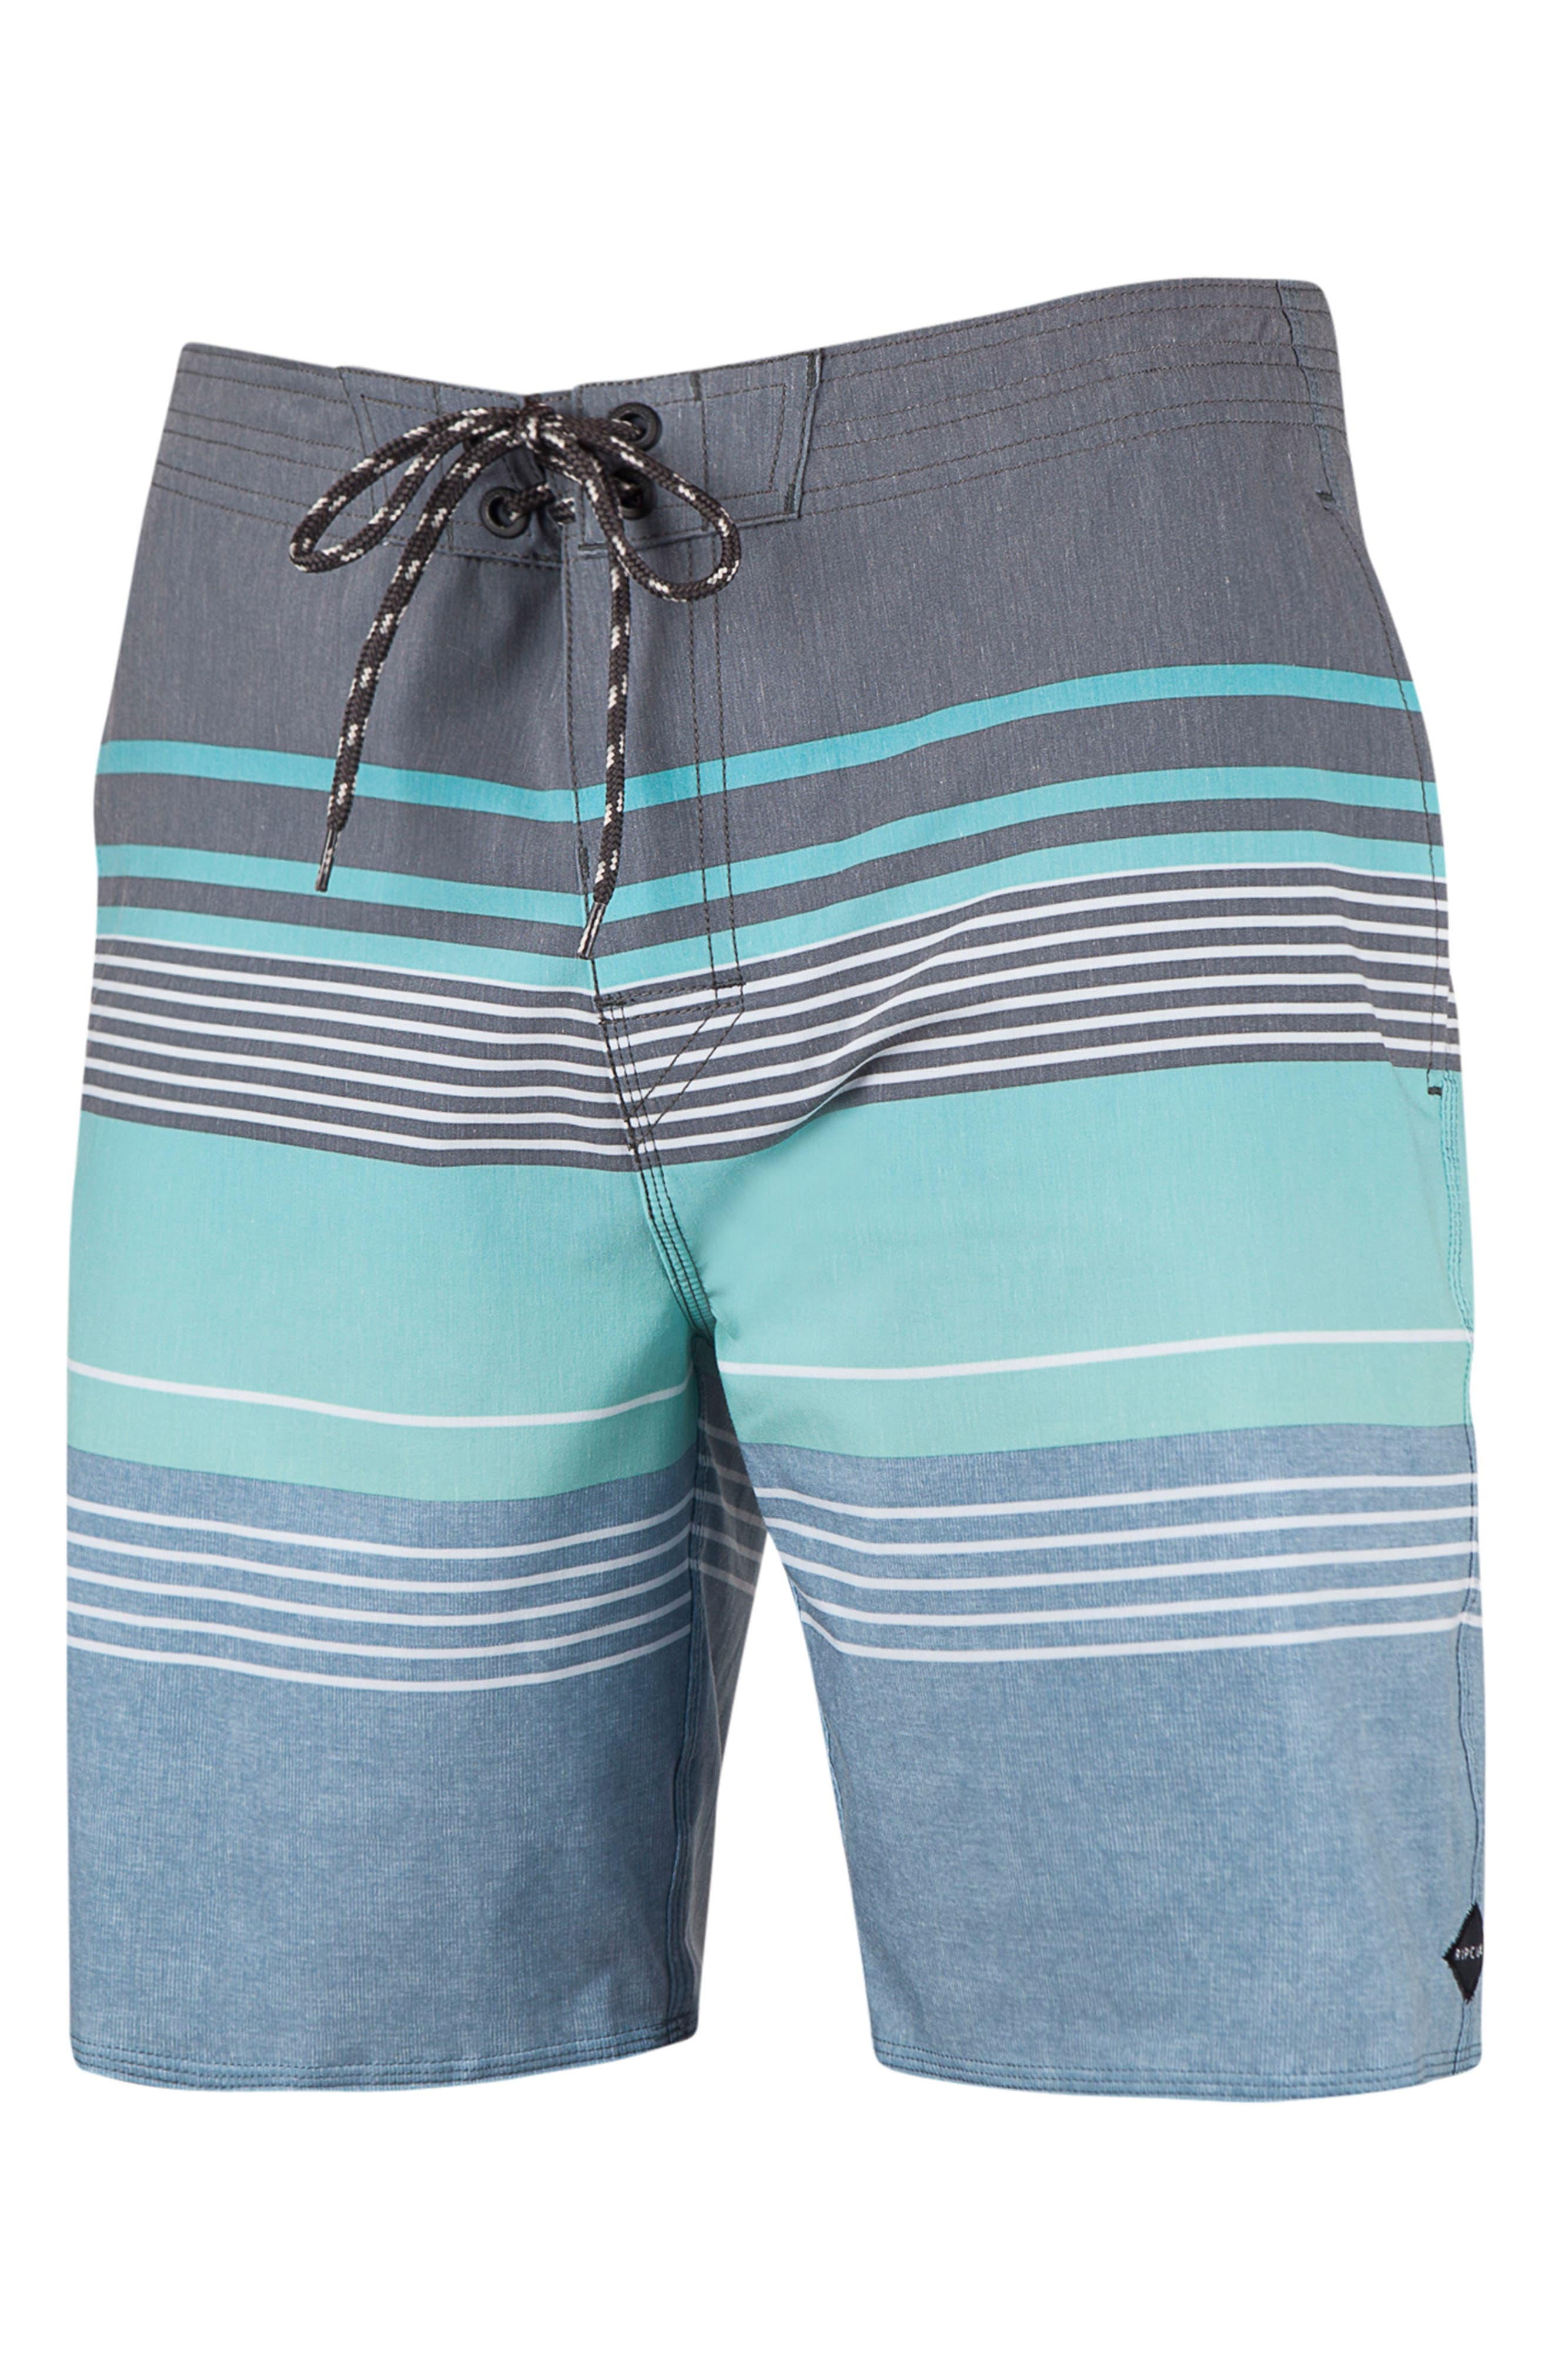 Rapture Layday Board Shorts,                         Main,                         color, 020